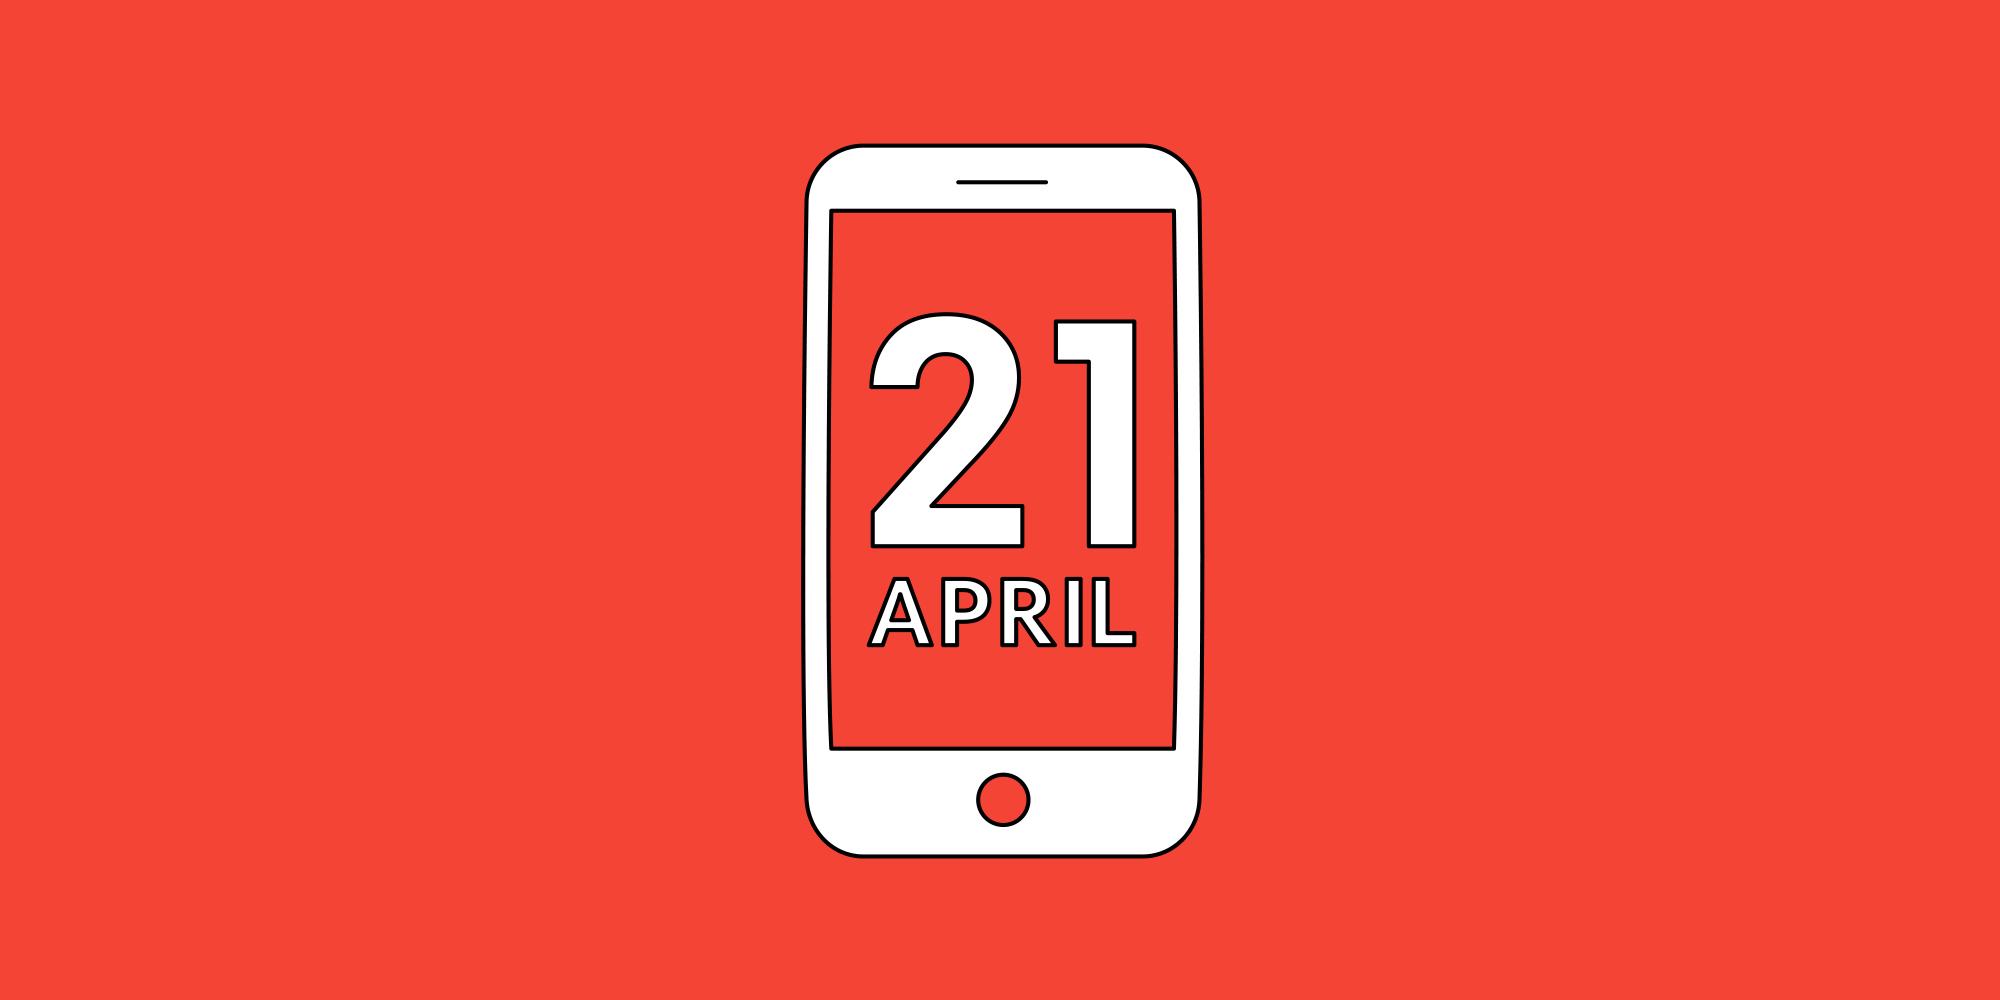 21st April